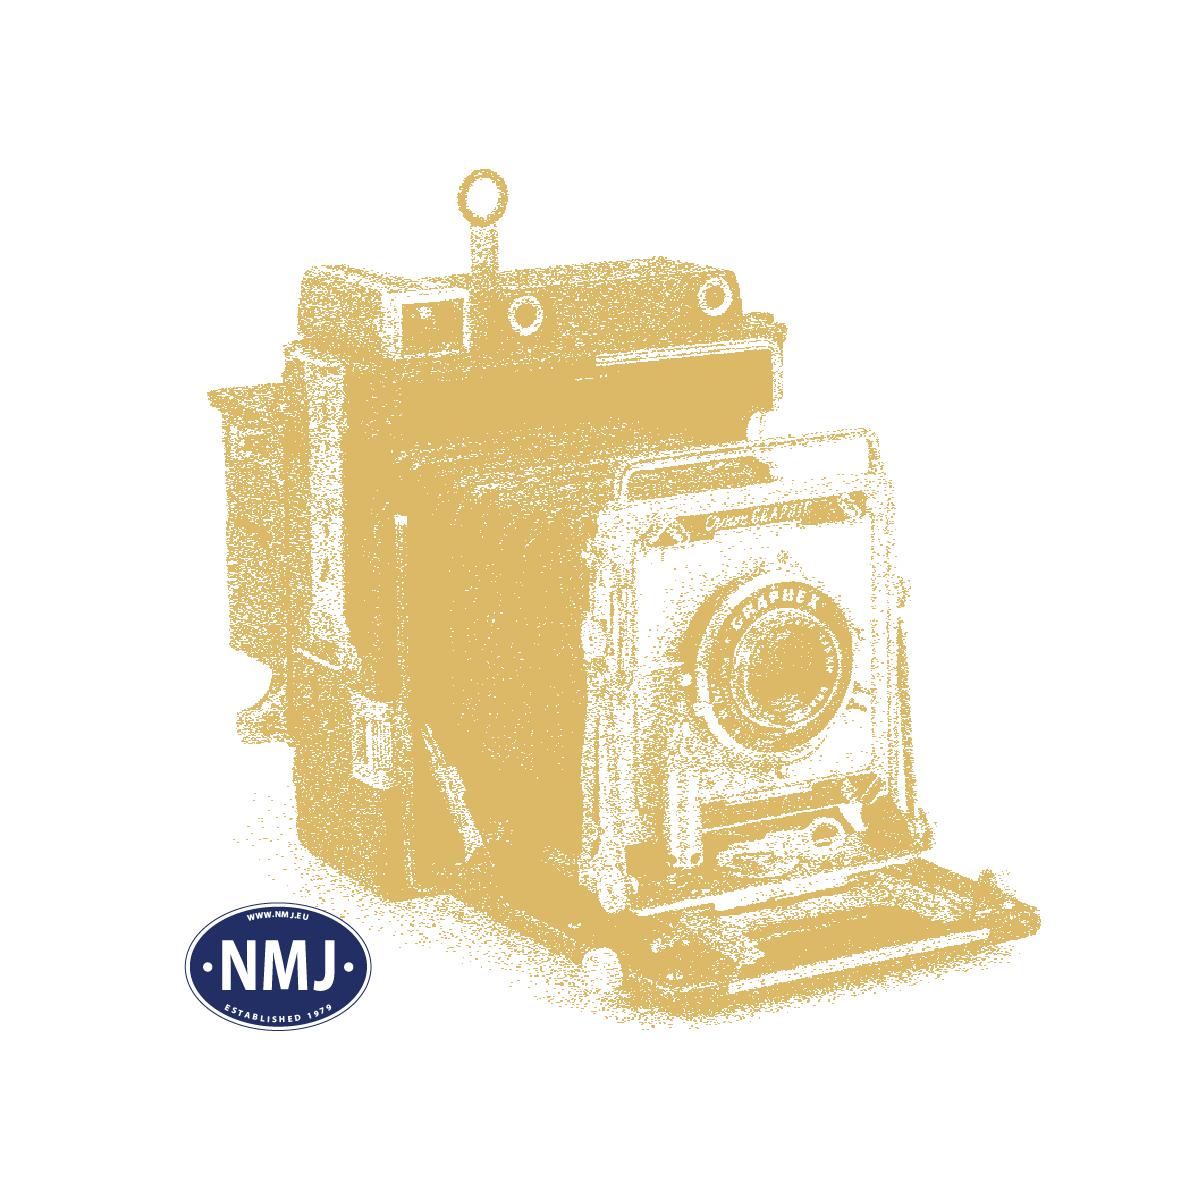 NMJT131.103 - NMJ Topline NSB B3 25512 type 3, Gammeldesign